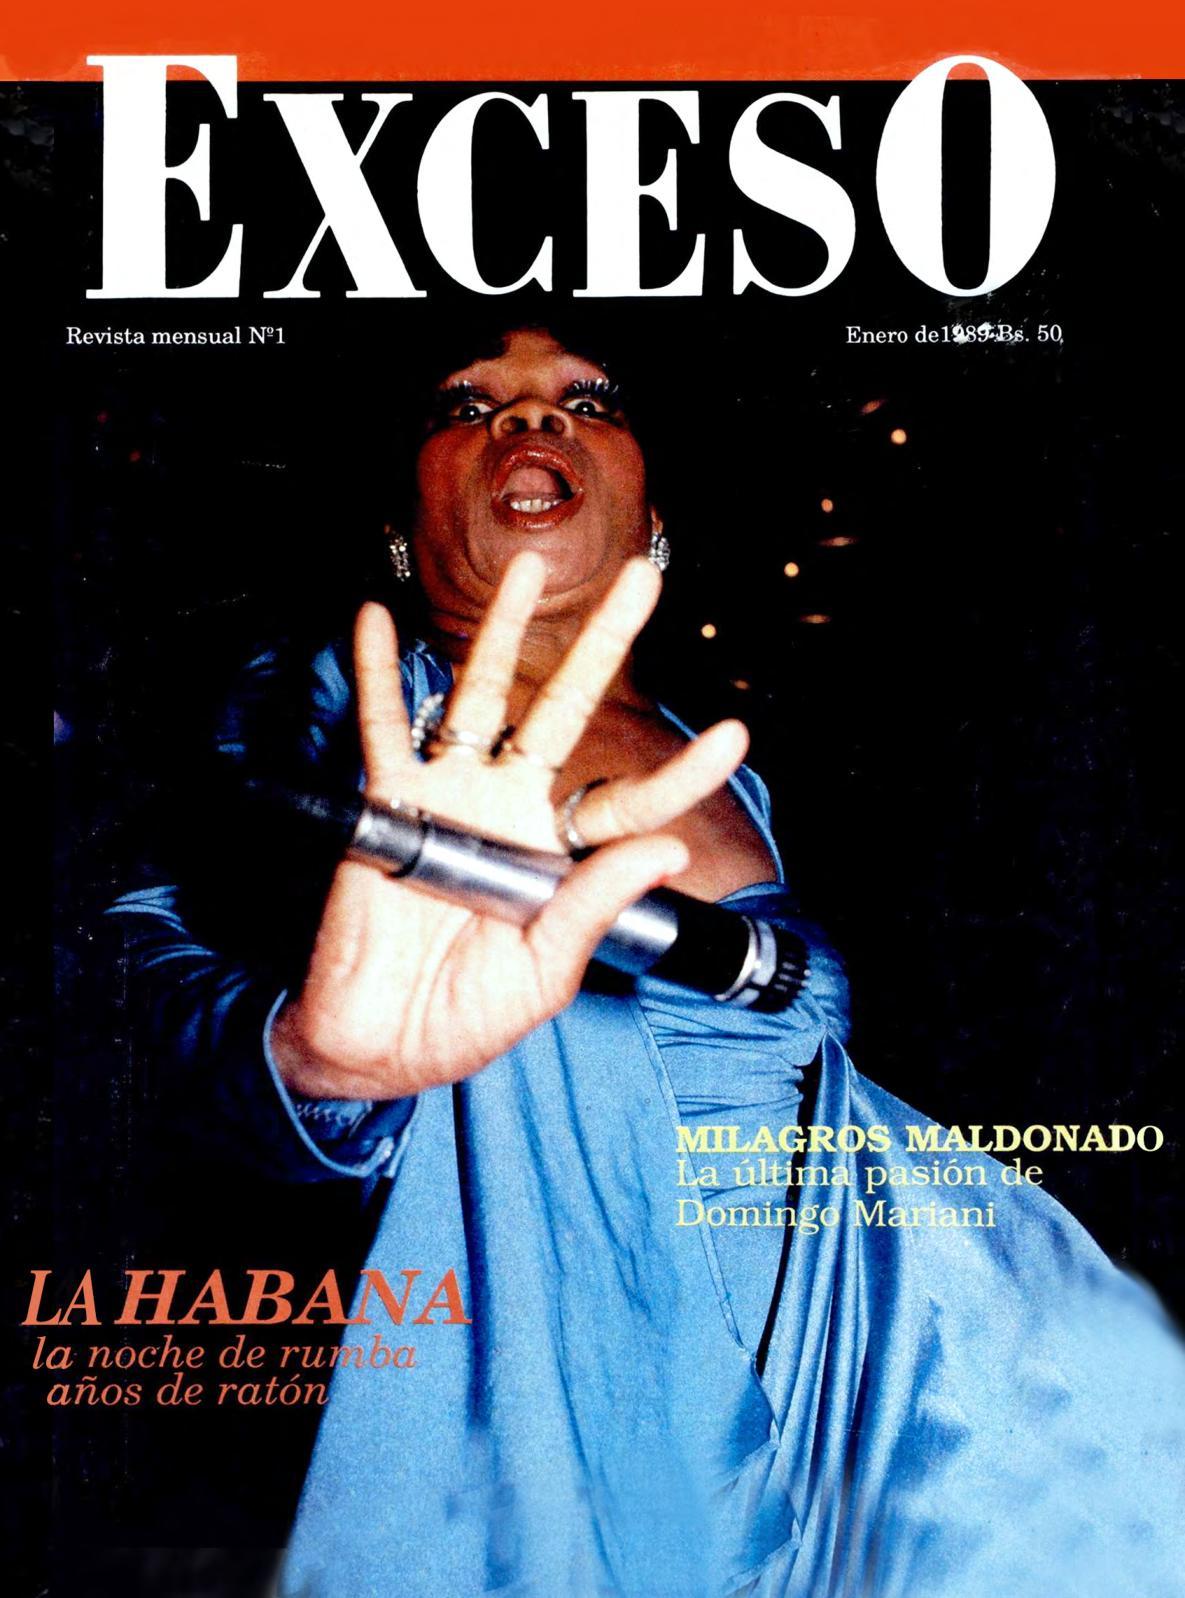 5863434c5 Calaméo - Revista Exceso Edicion Nº 1 Enero 1989